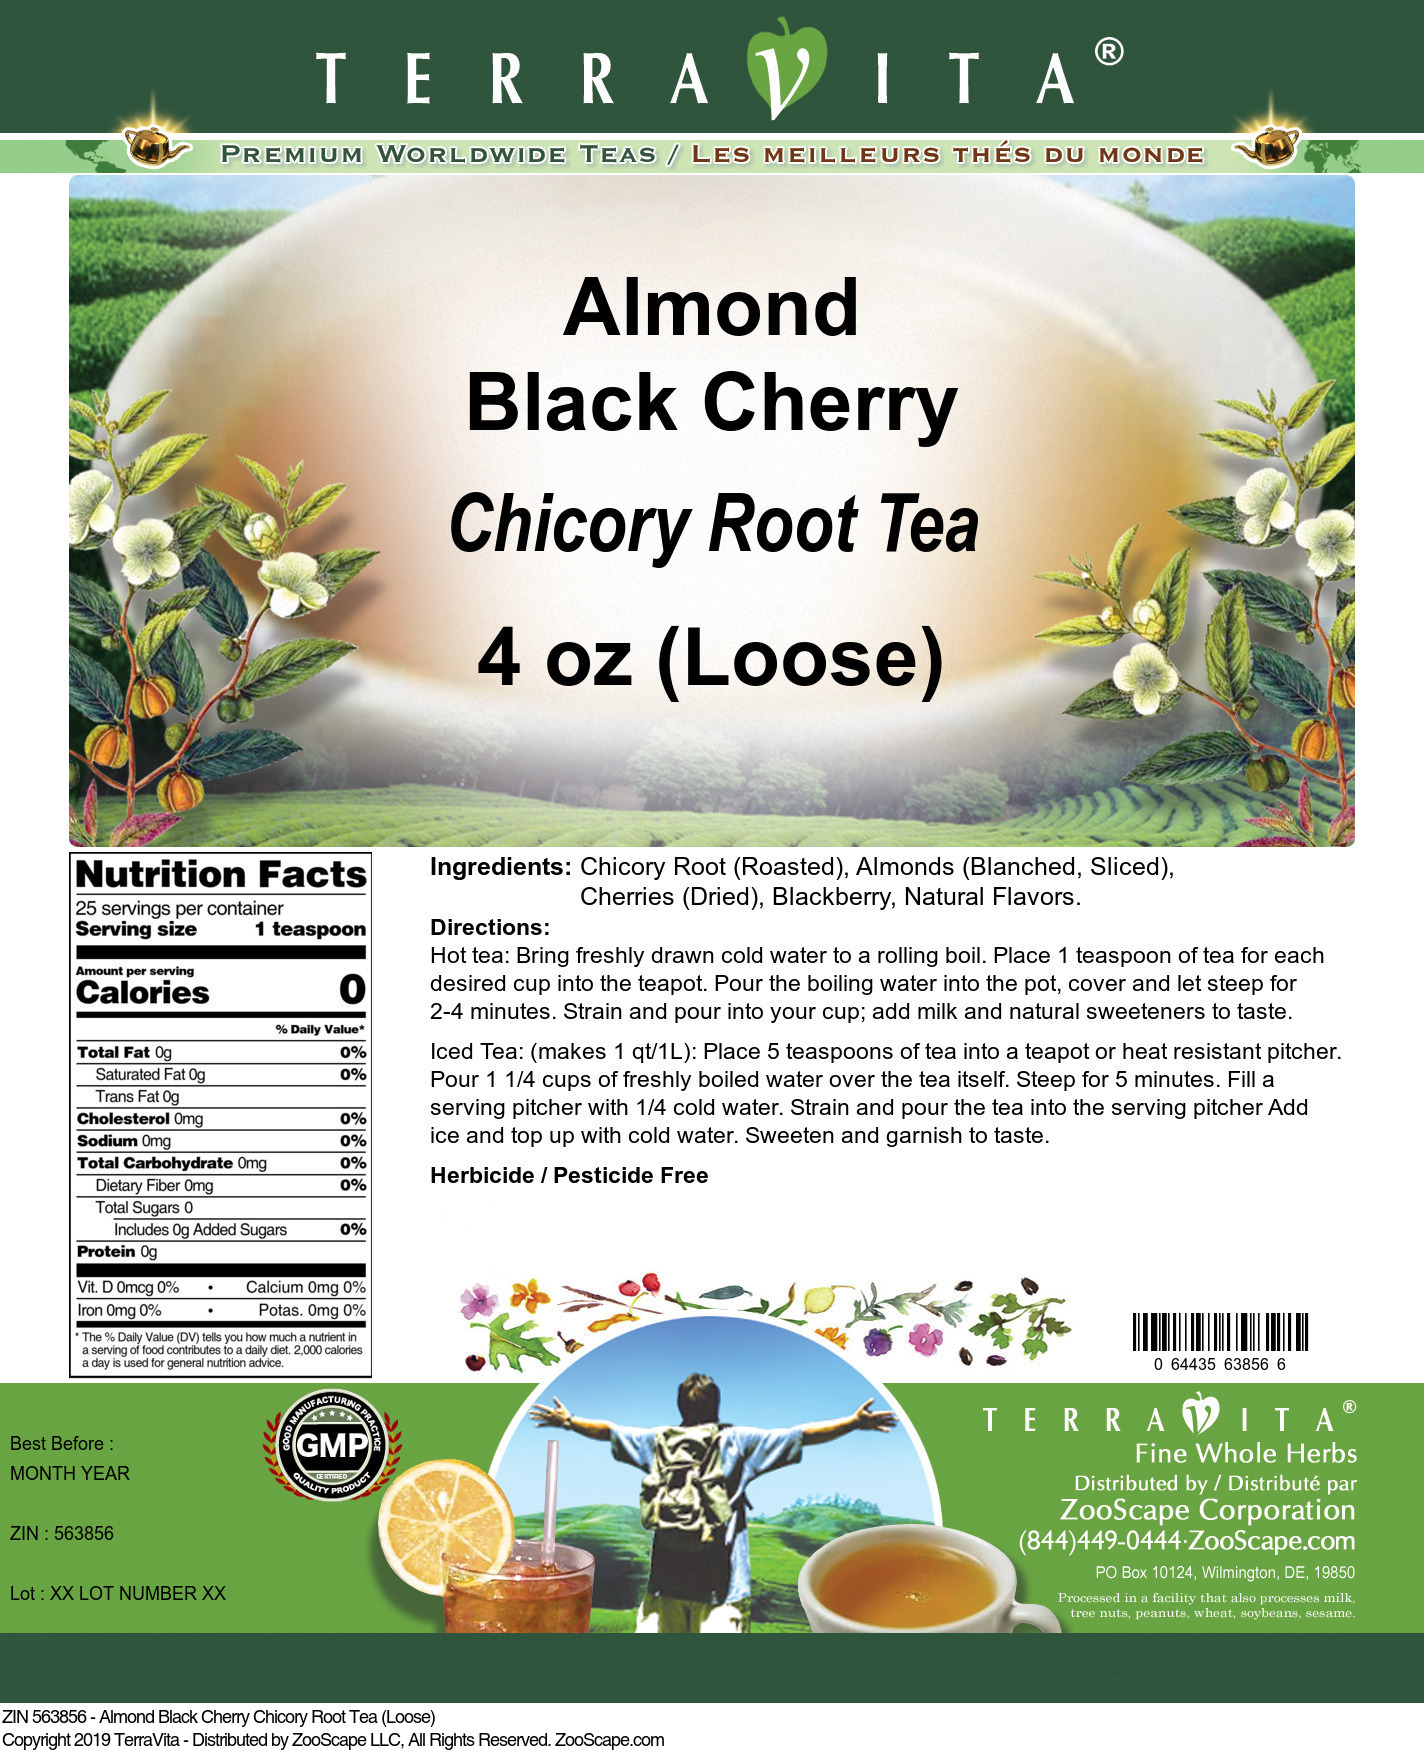 Almond Black Cherry Chicory Root